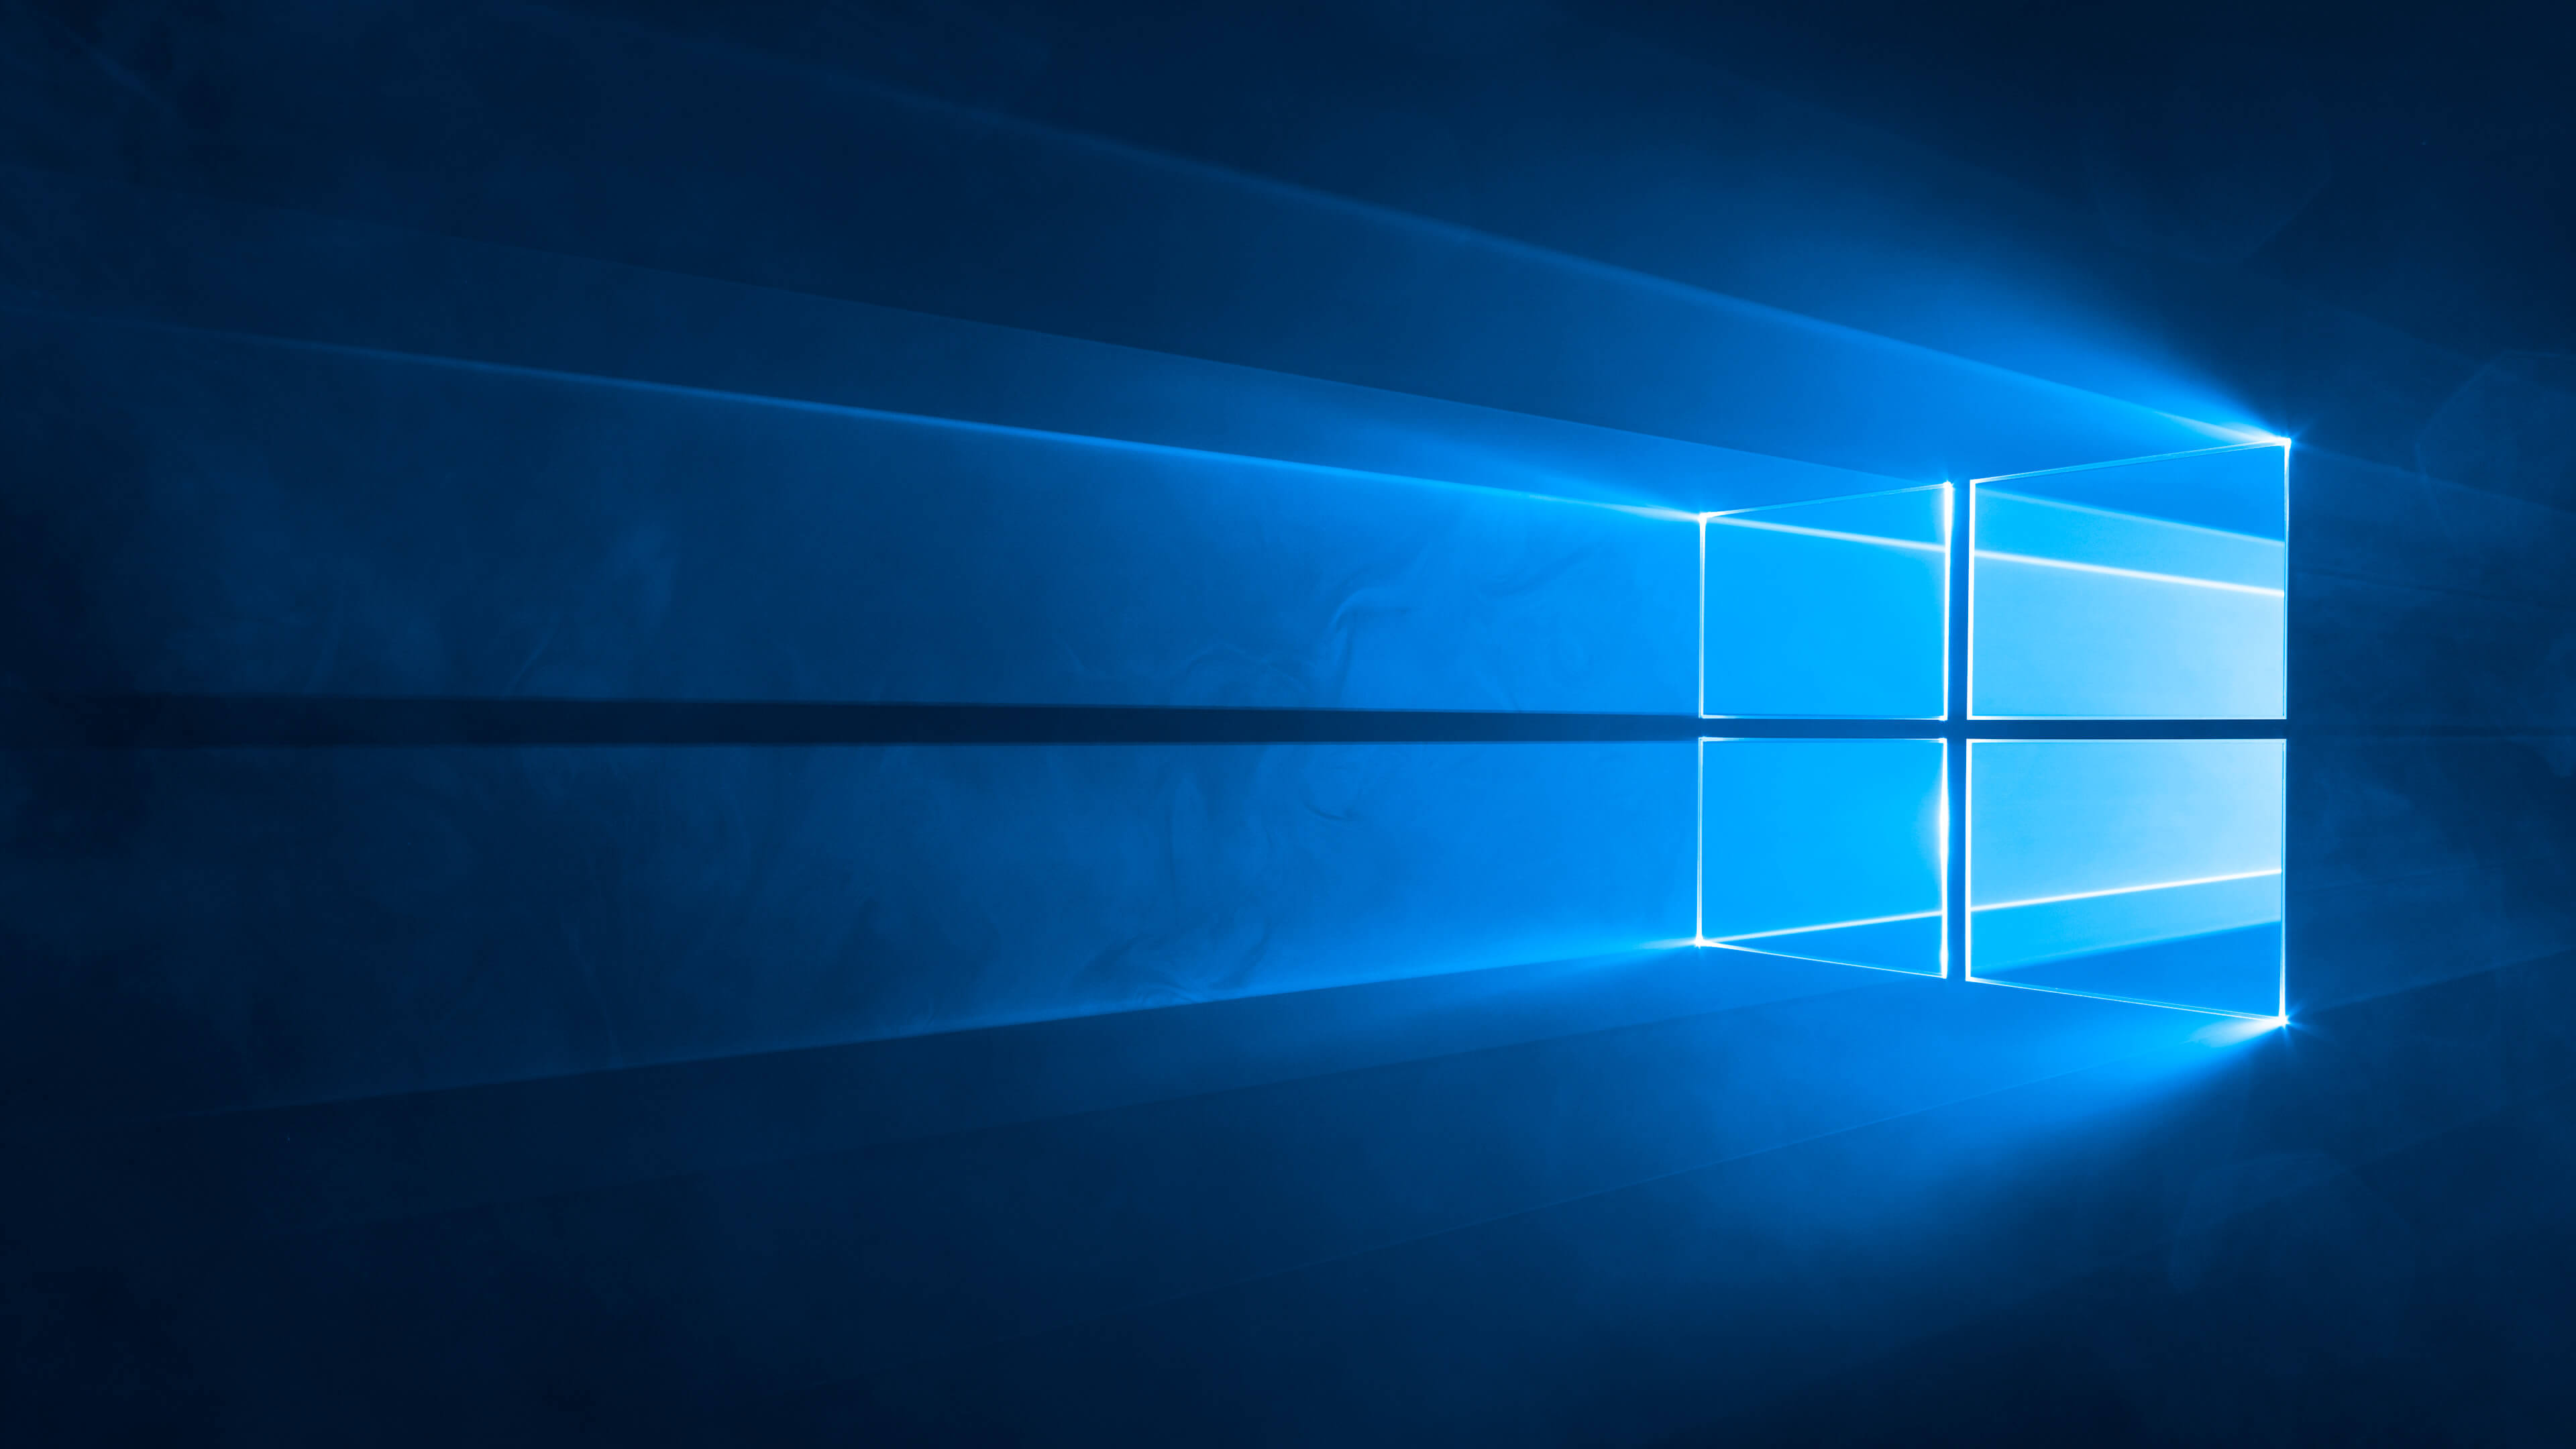 windows 7 default hd wallpaper - live desktop wallpaper